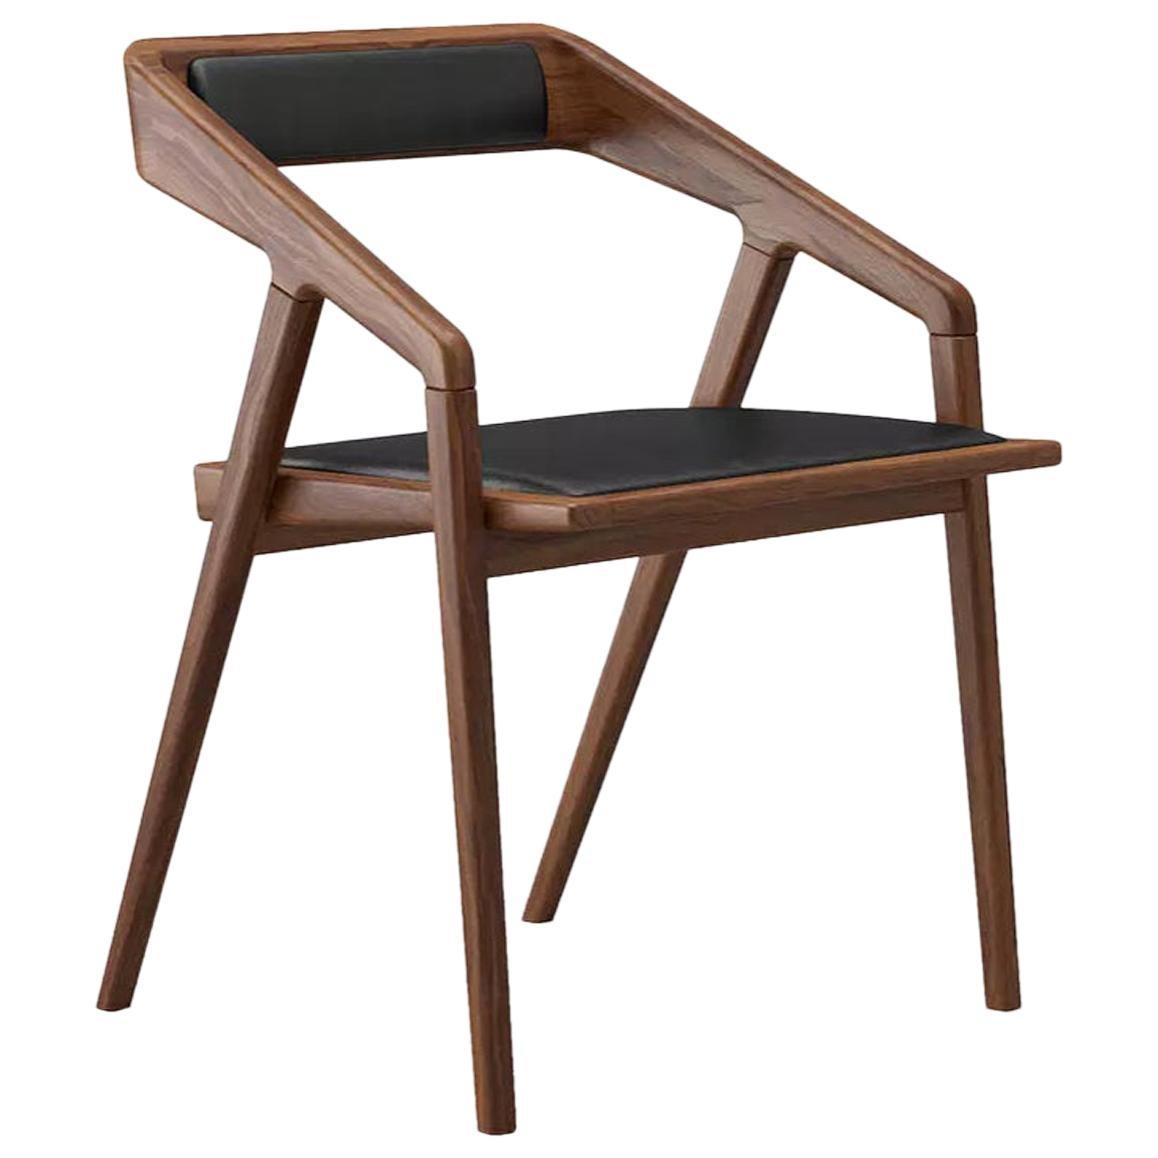 Katakana Dining Chair by Dare Studio